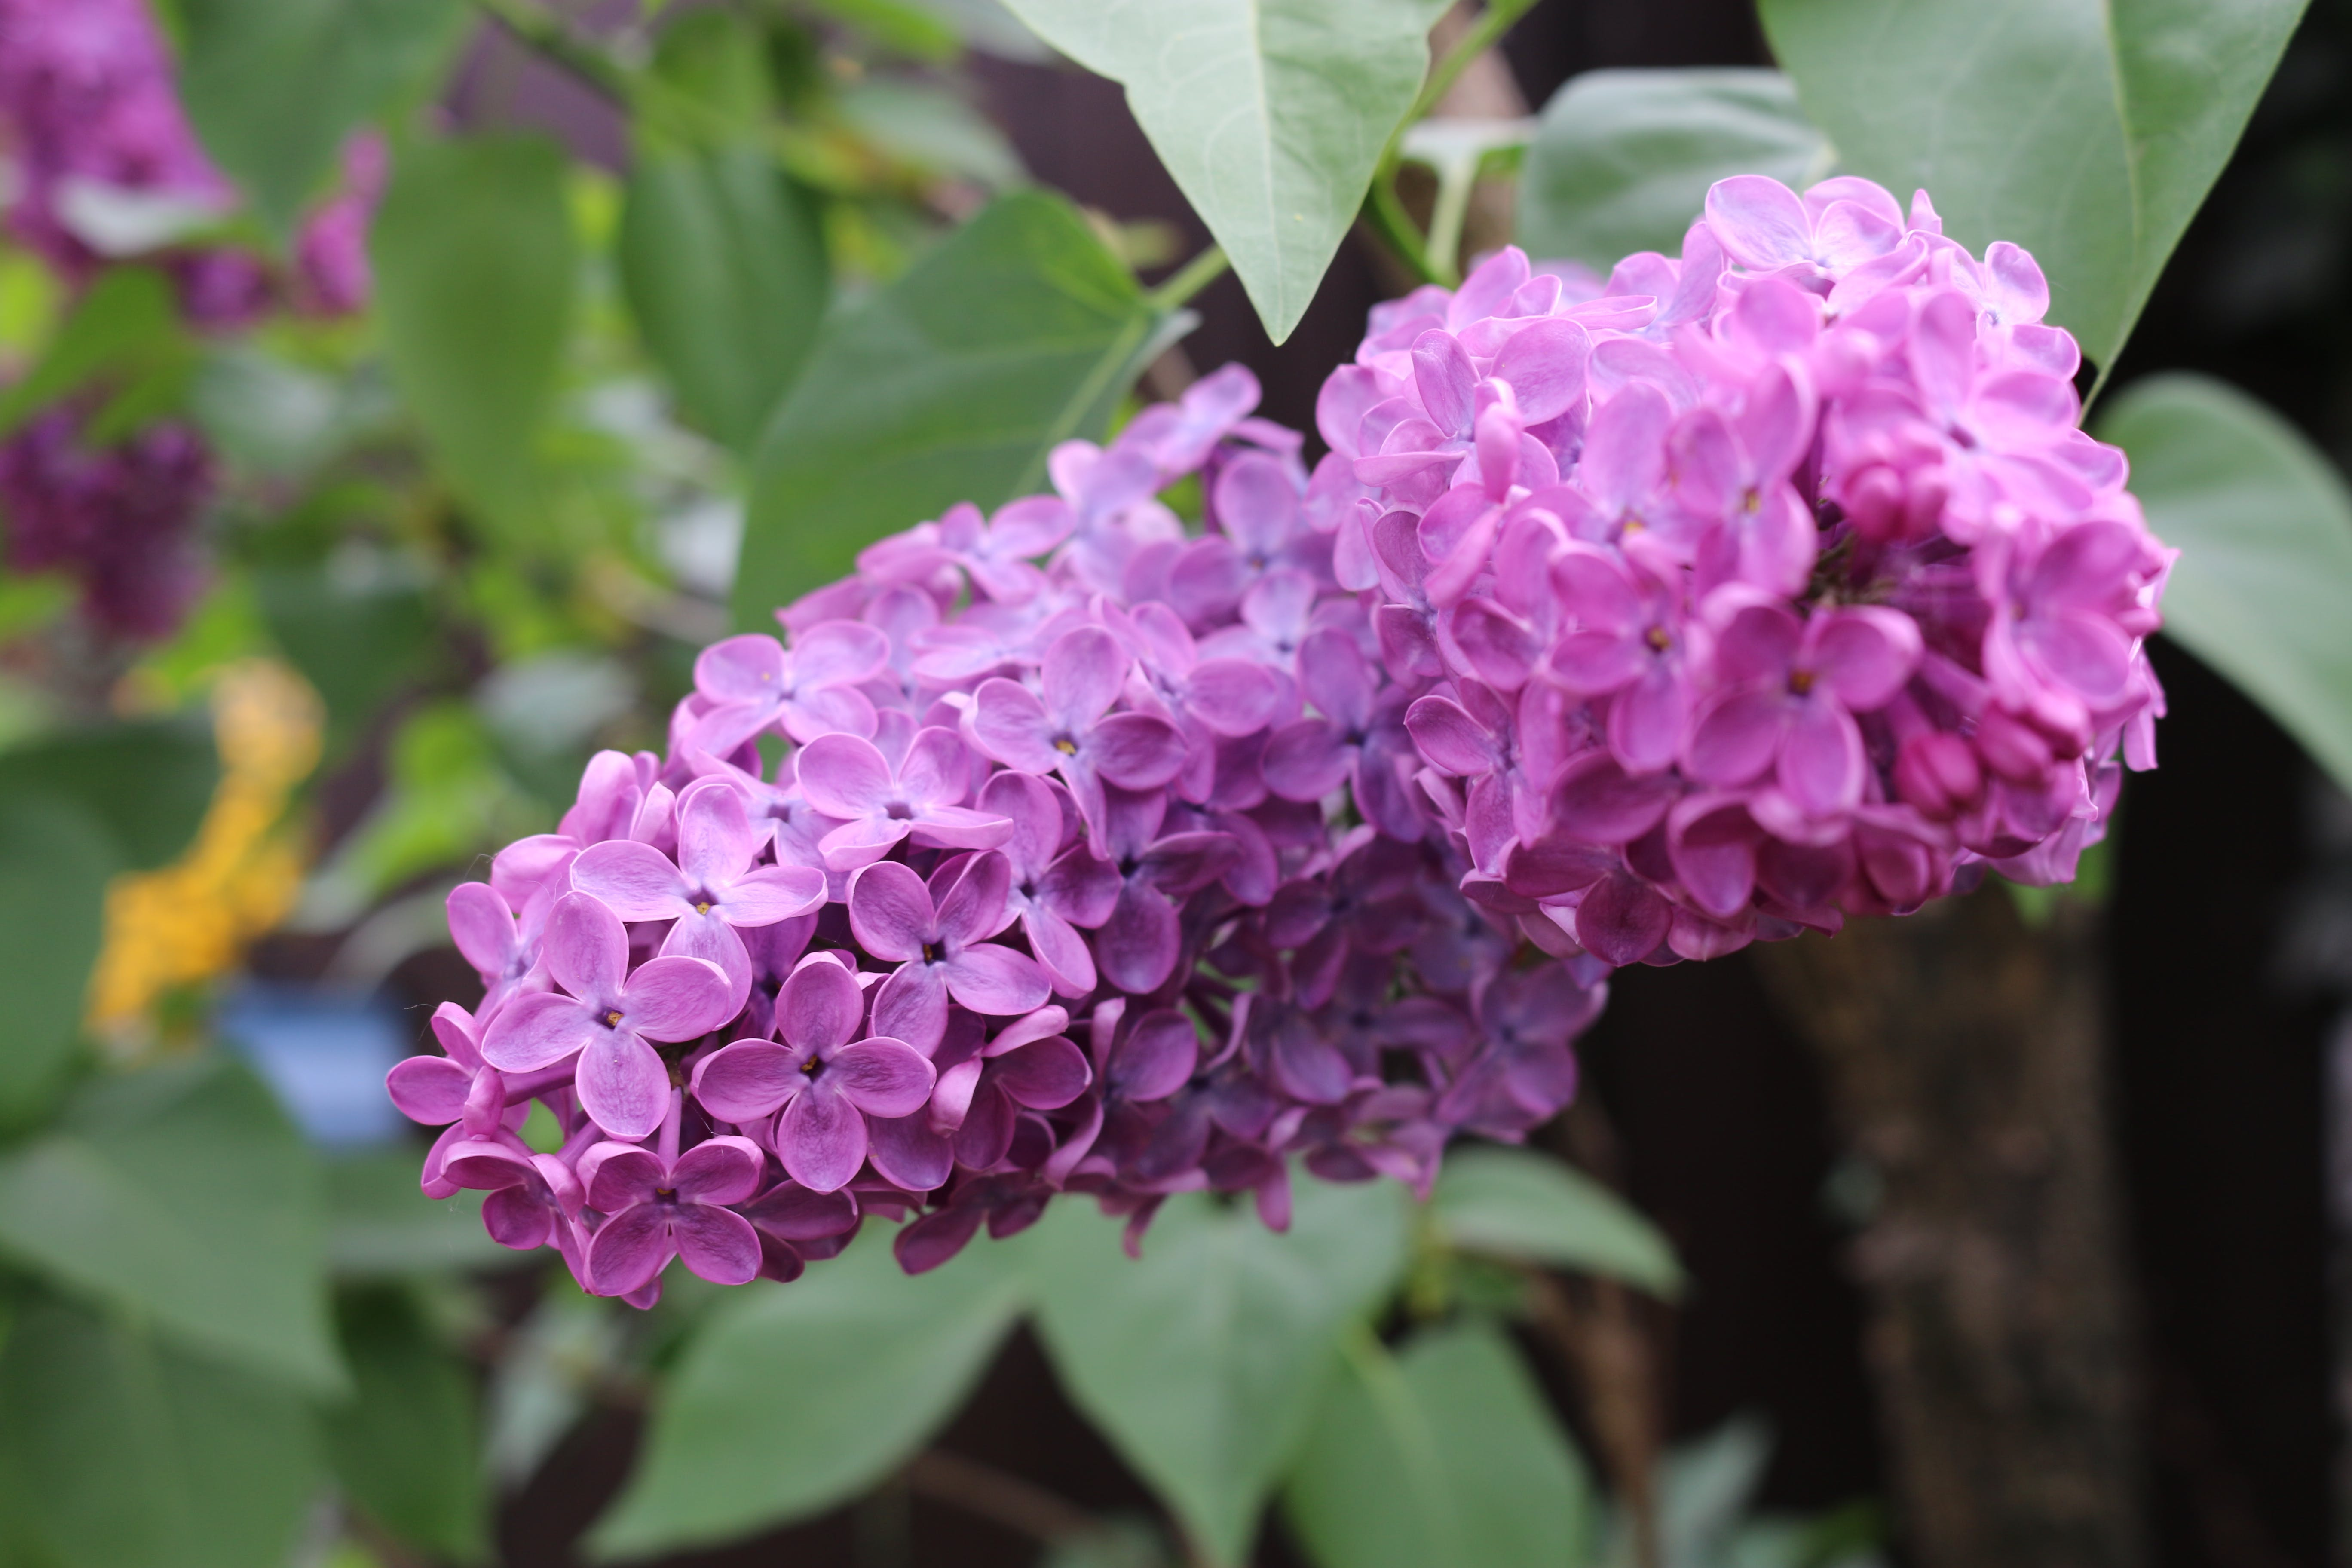 Free stock photo of flower, nature, plant, purple